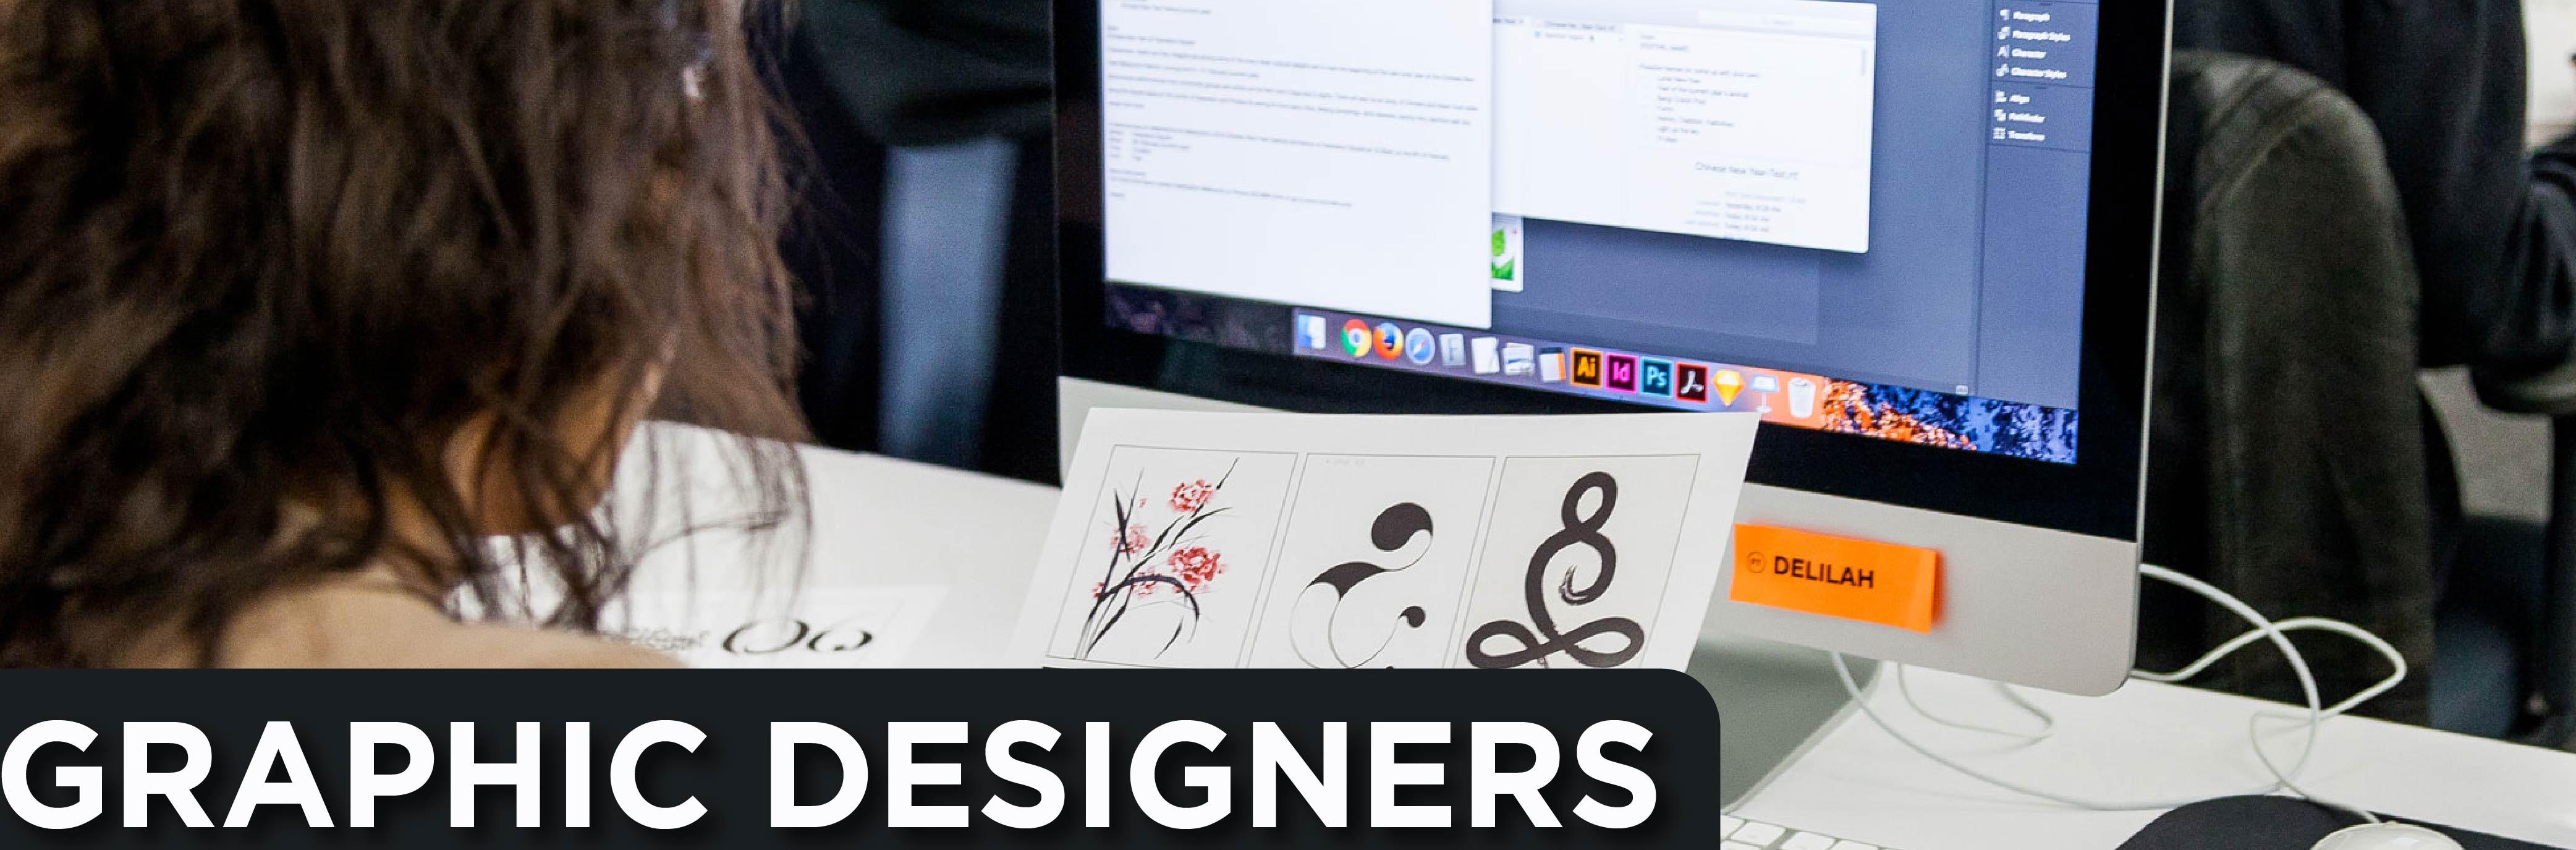 Graphic Designers & Videographers